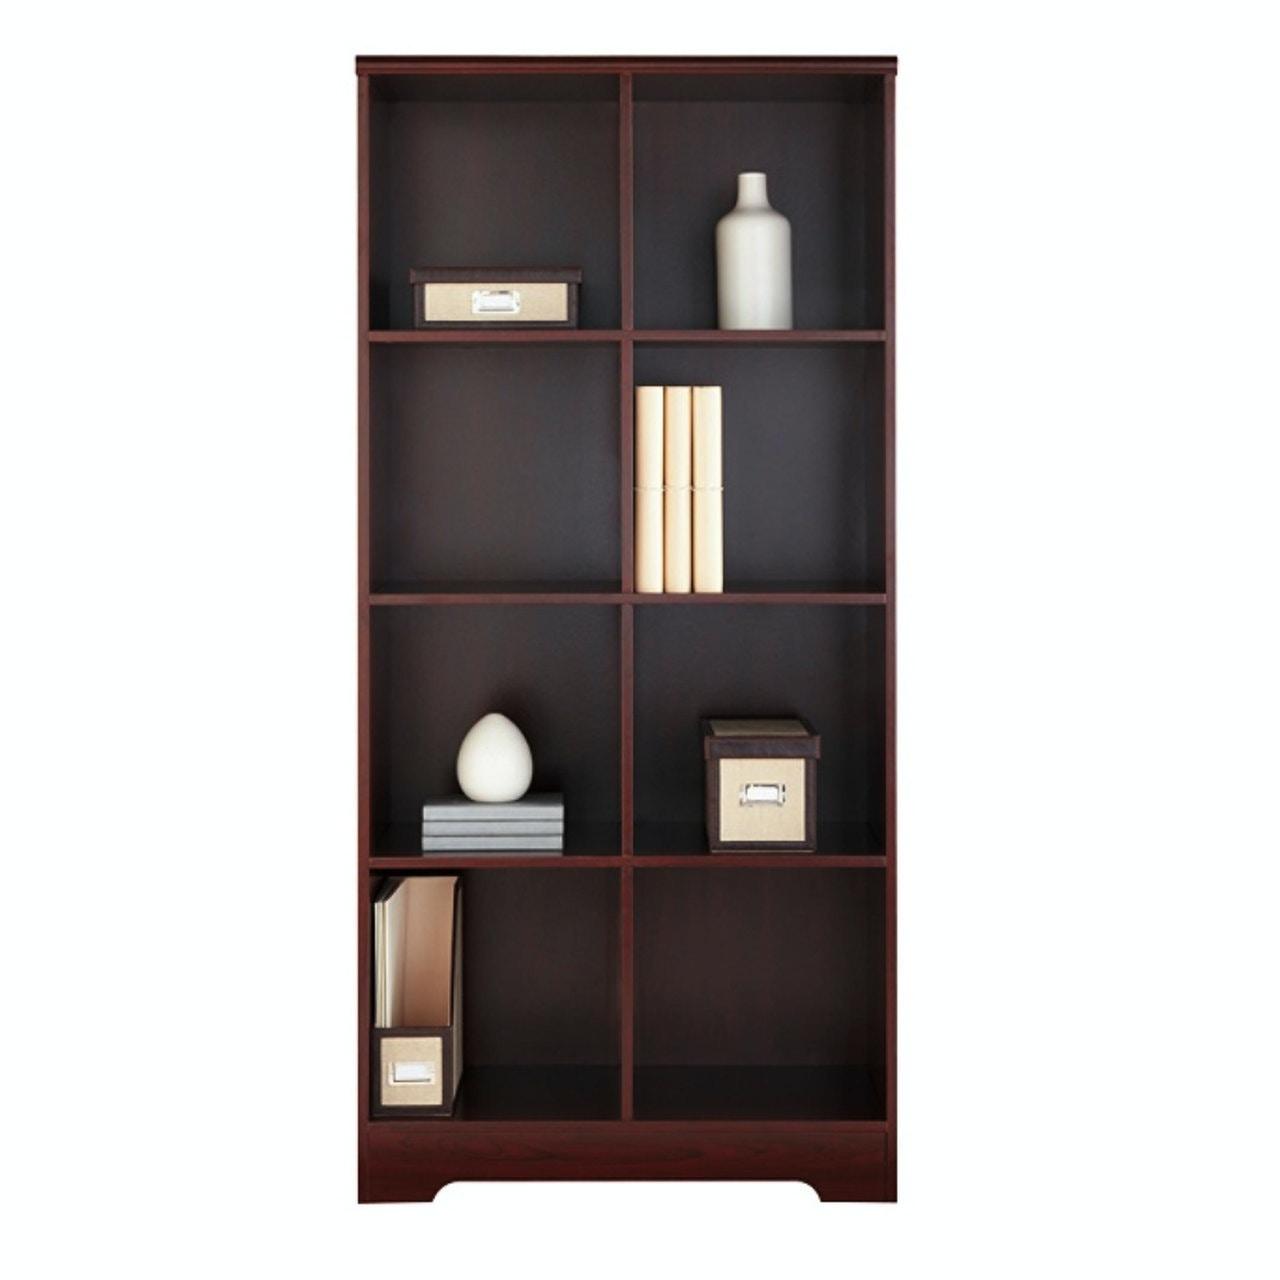 American Furniture Classics Large 8 Cube Storage Organizing Bookcase    Classic Cherry 117